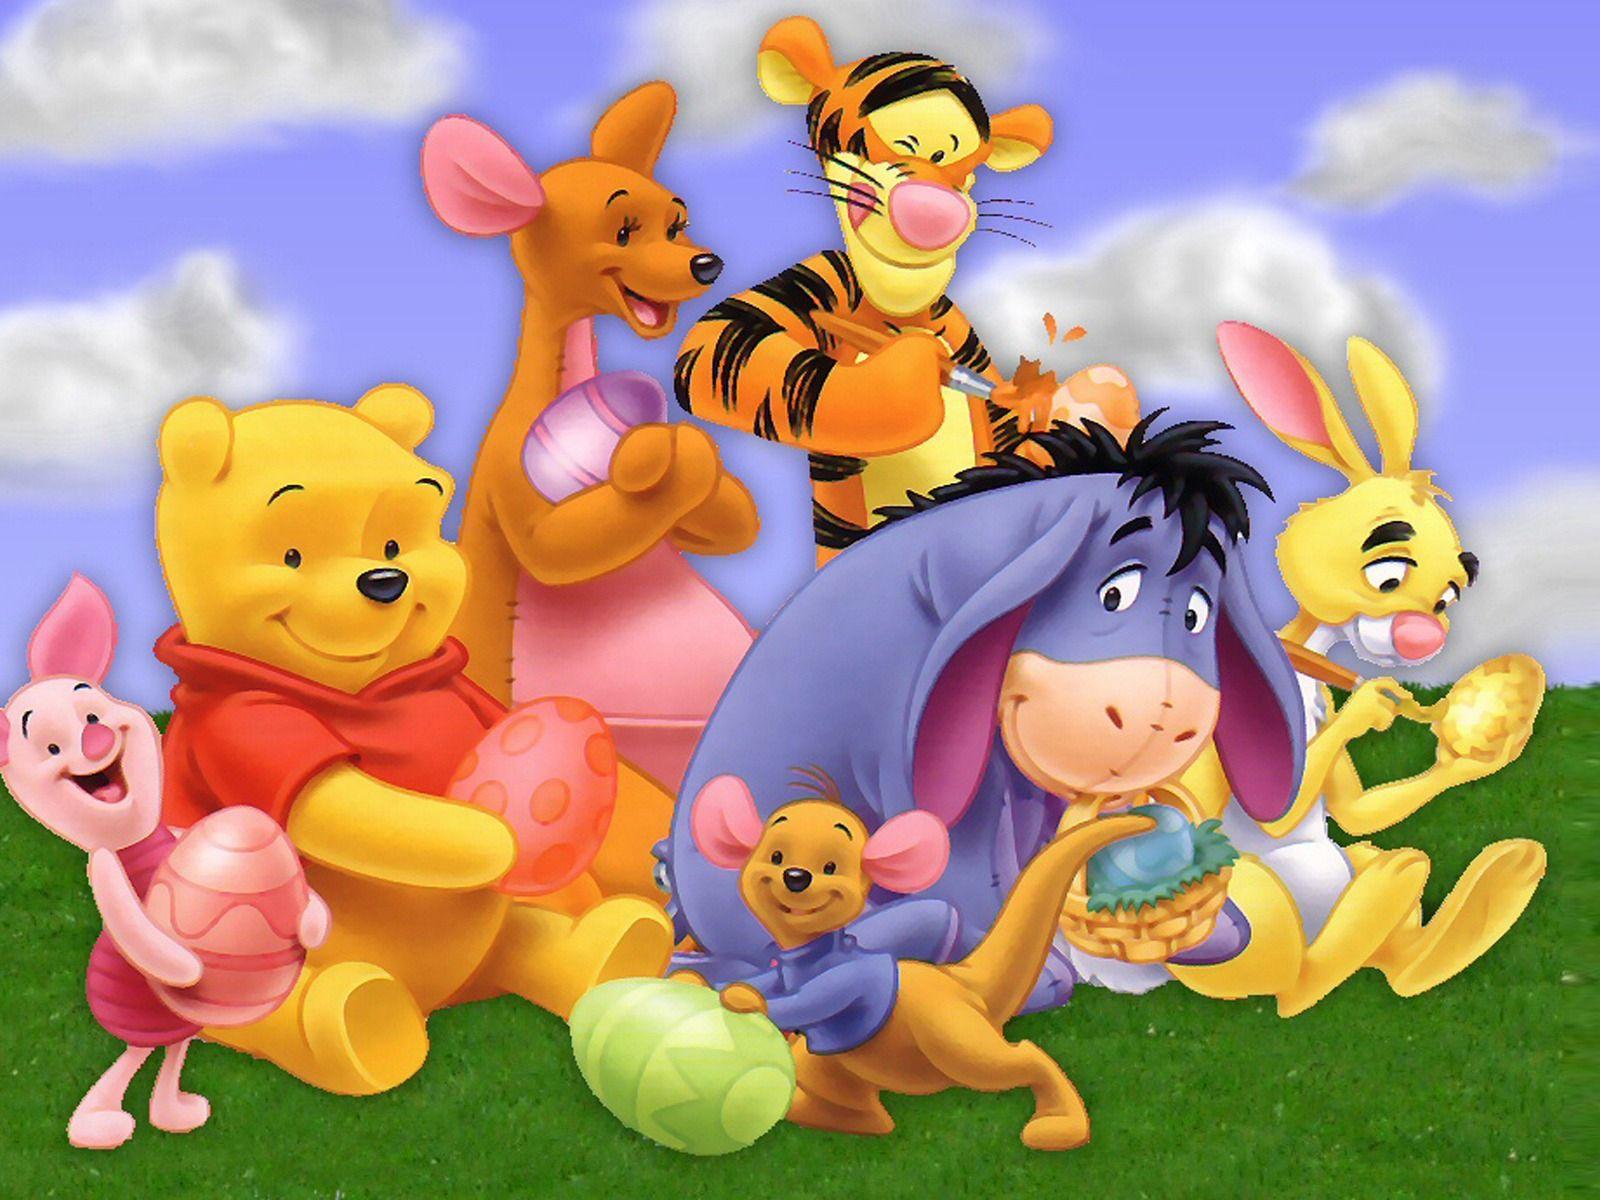 Winnie The Pooh Cartoon Character Hd Desktop Wallpaper Second